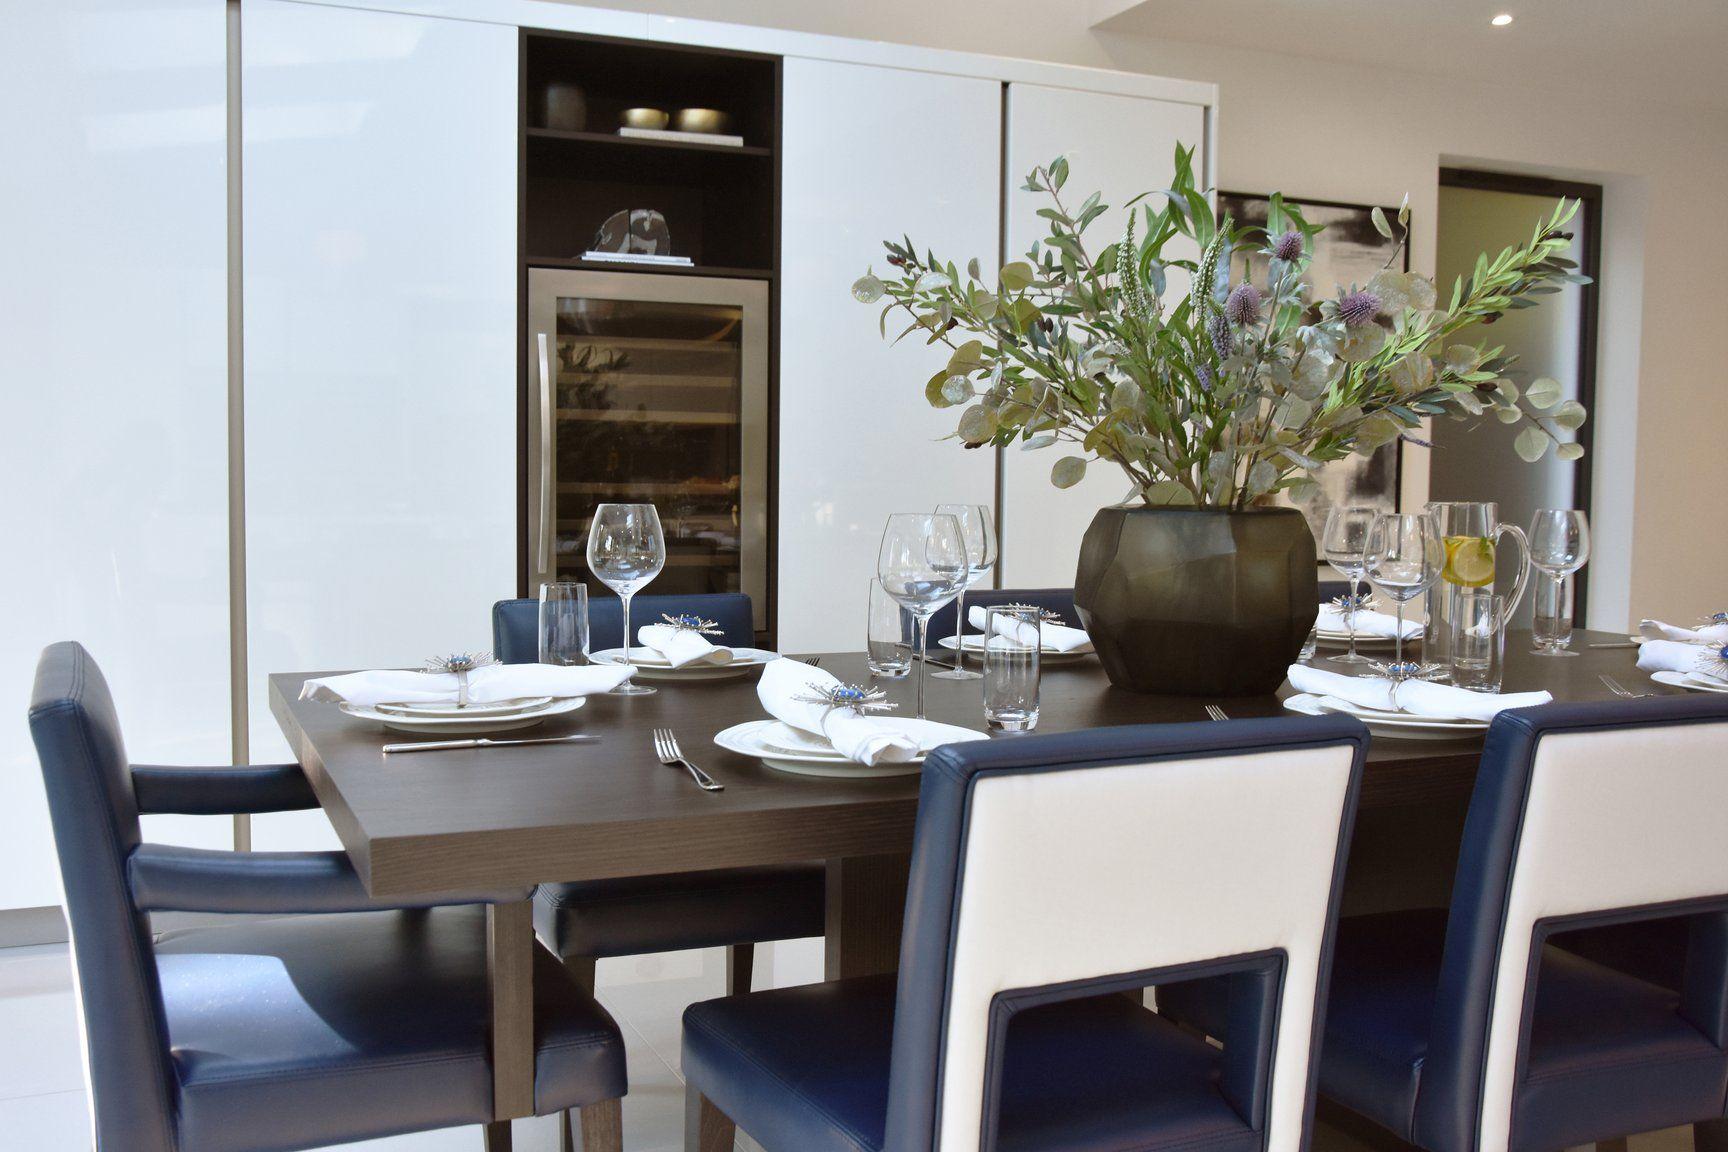 Interior Design Company based in Fulham, London  We